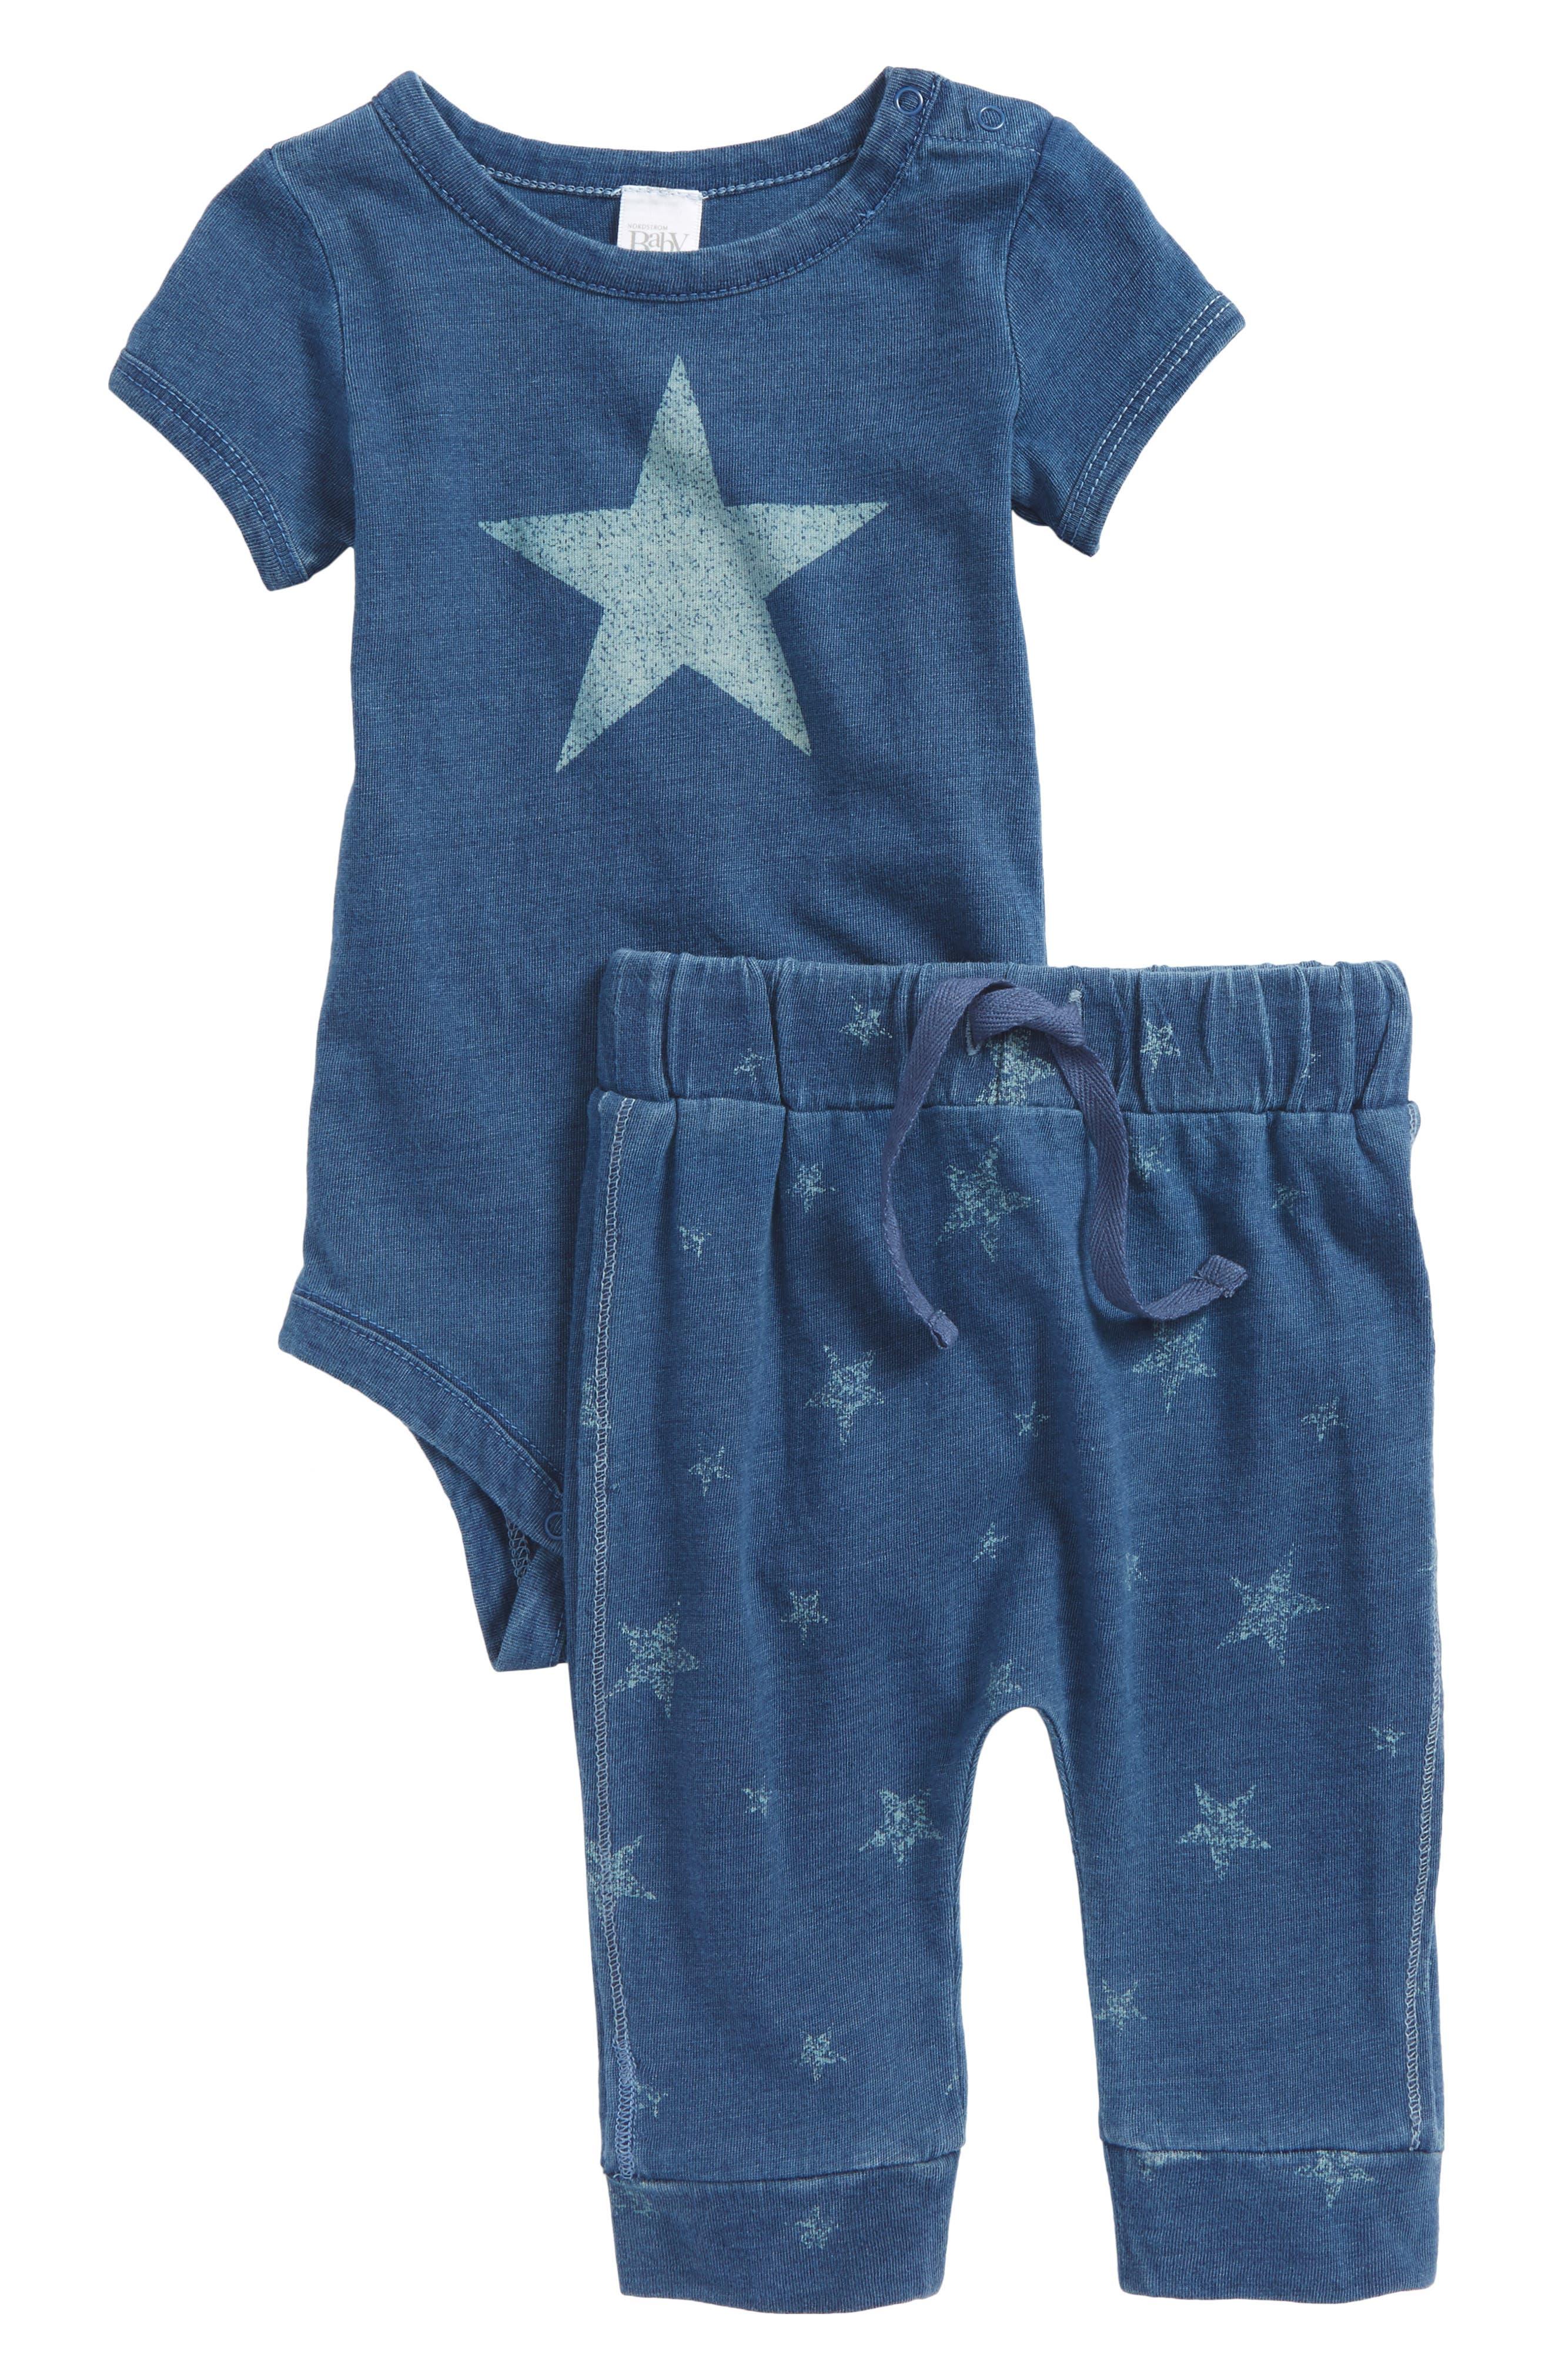 Star Bodysuit & Pants Set,                         Main,                         color, Blue Indigo Star